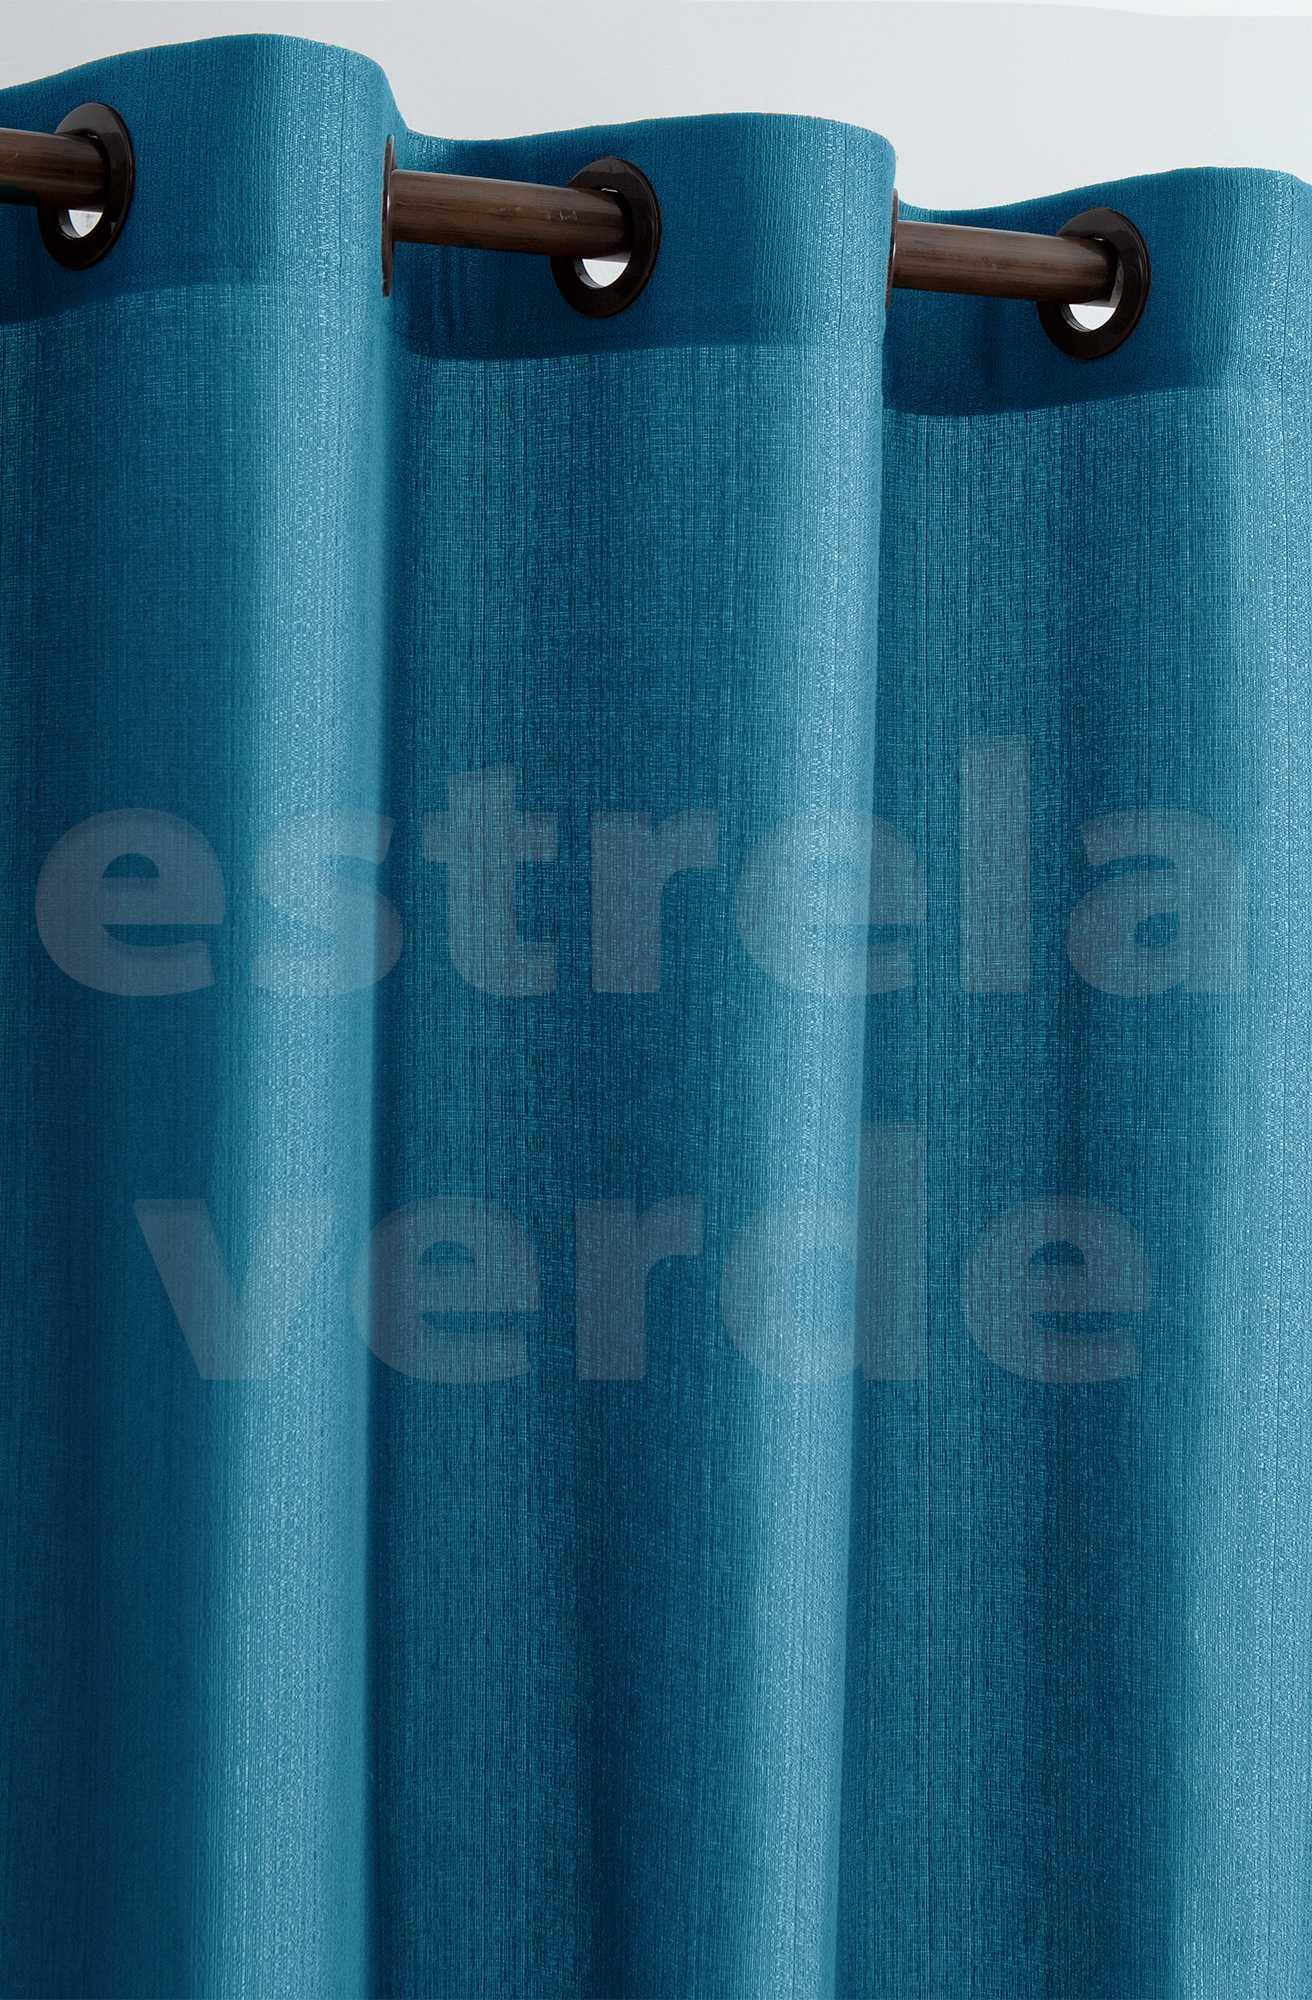 CORTINA VENEZA 2,60X1,70 4106 ARDOSIA  - Estrela Verde